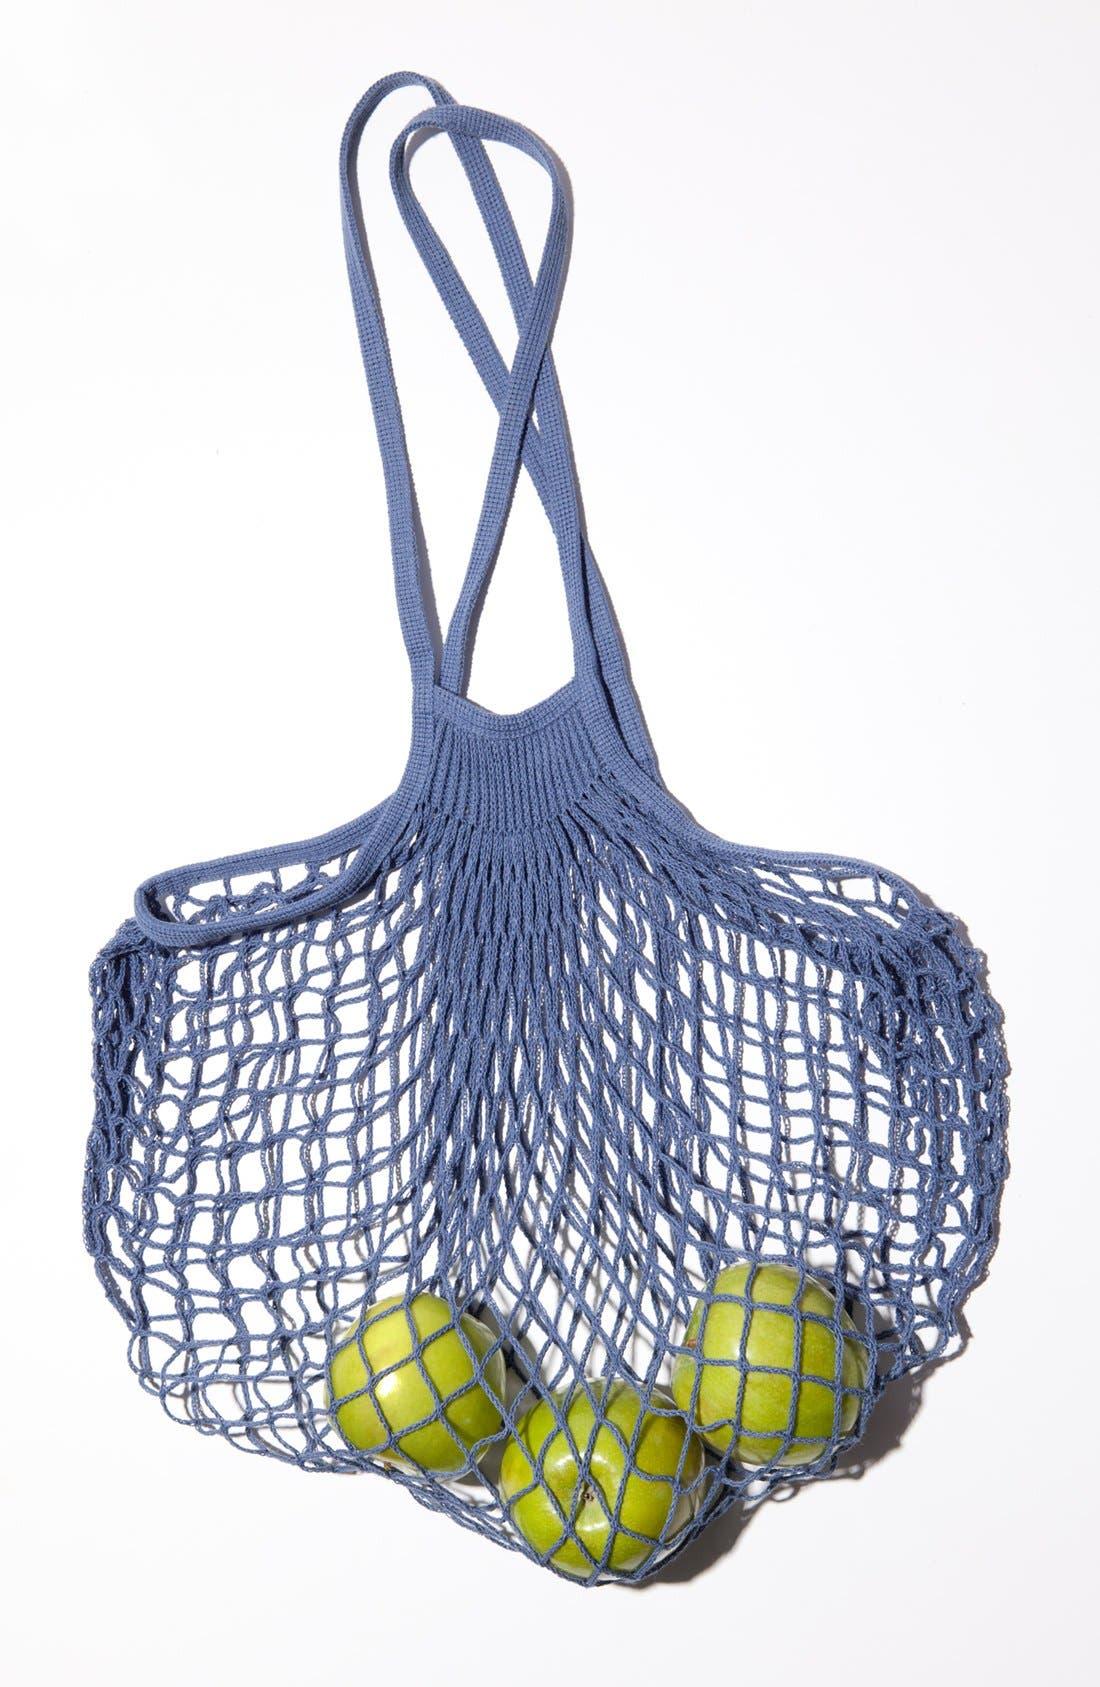 Main Image - Merci 'Filet à Provision' Bleu Net Shopping Bag